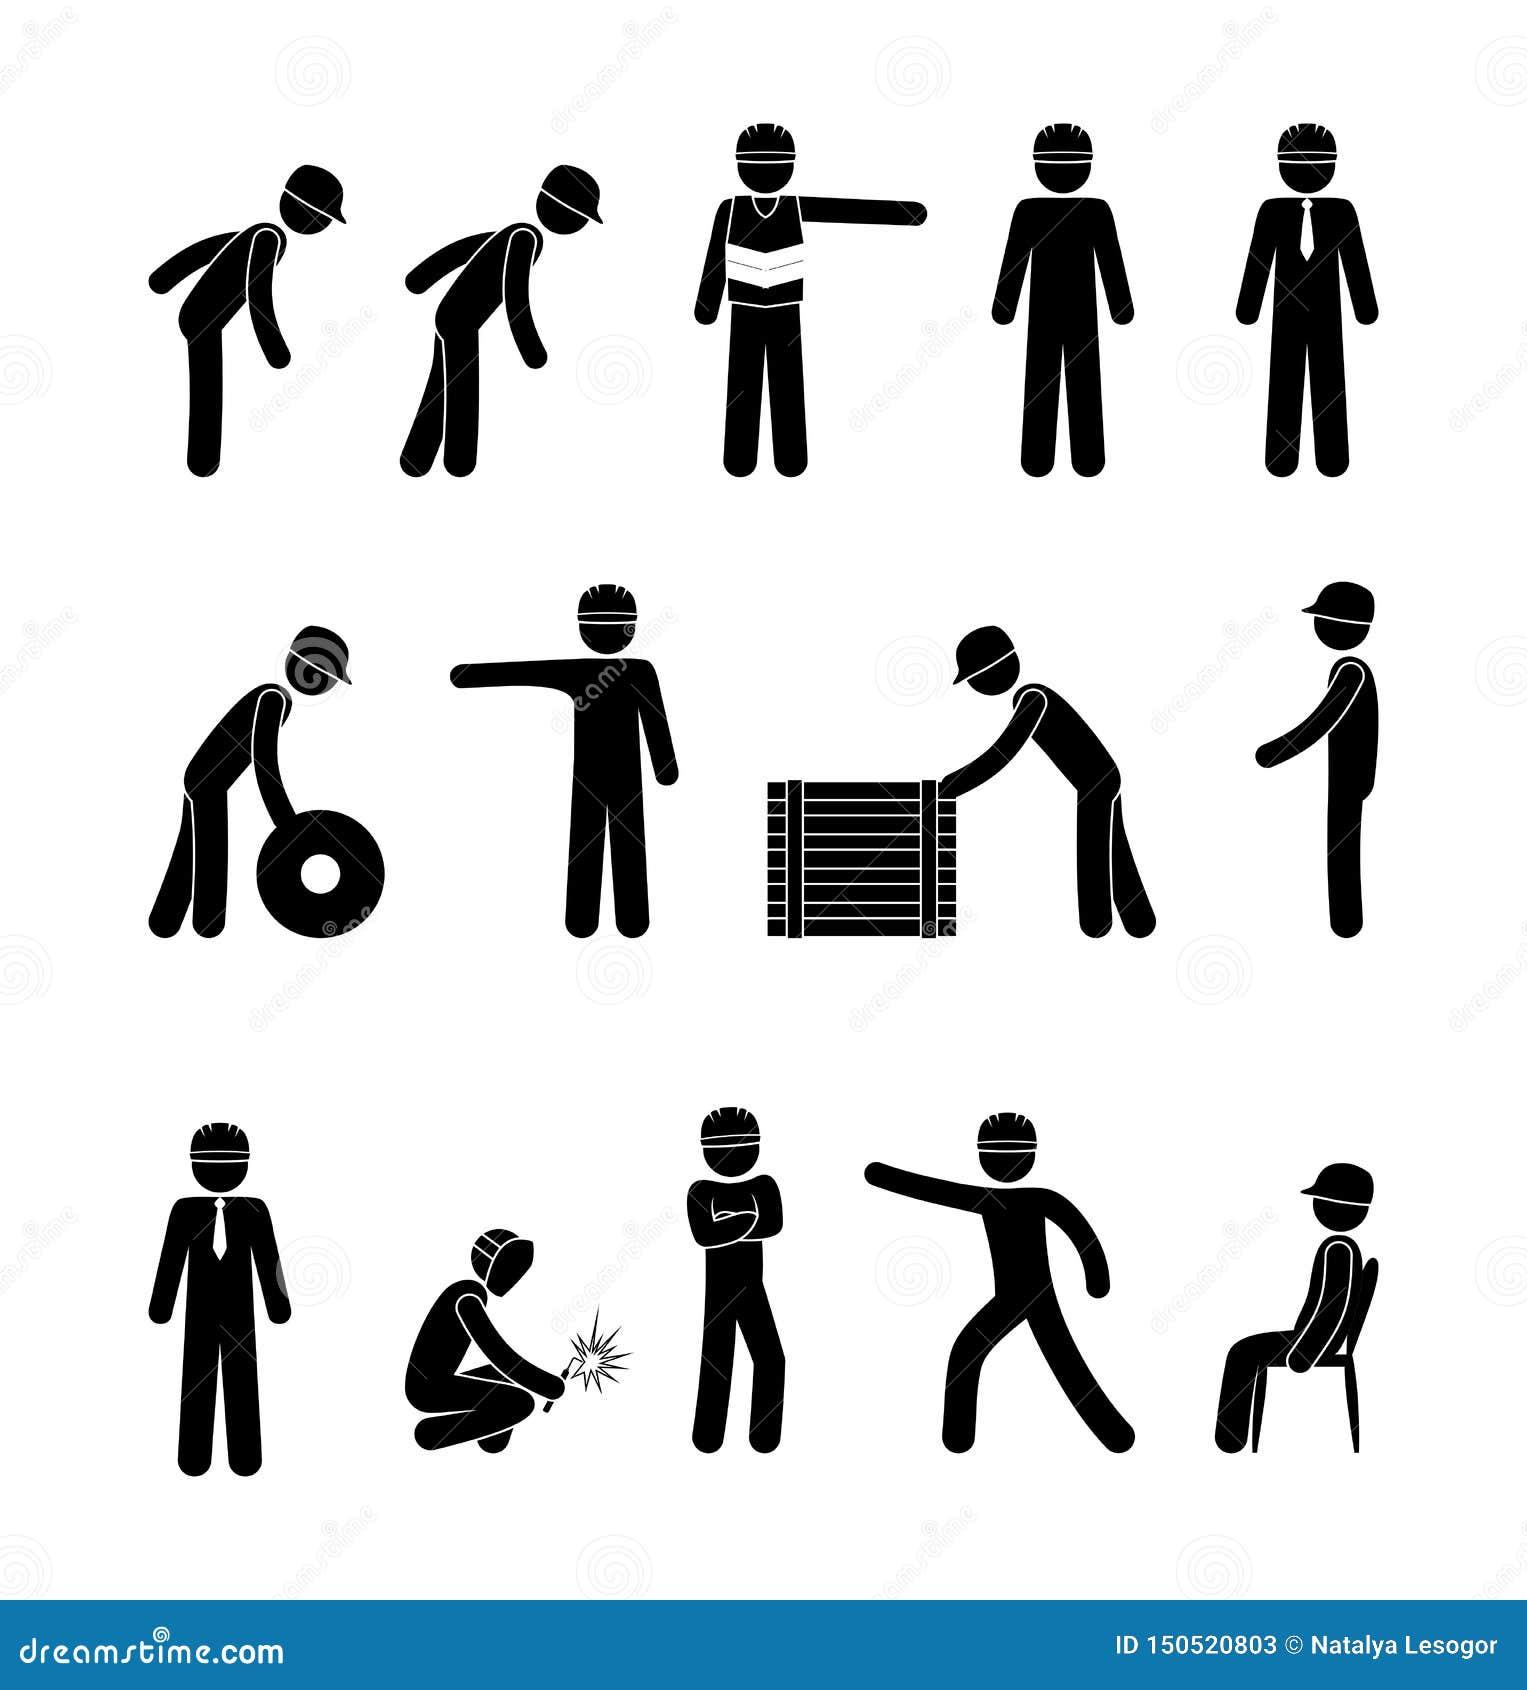 stick figure man icon workwear illustration